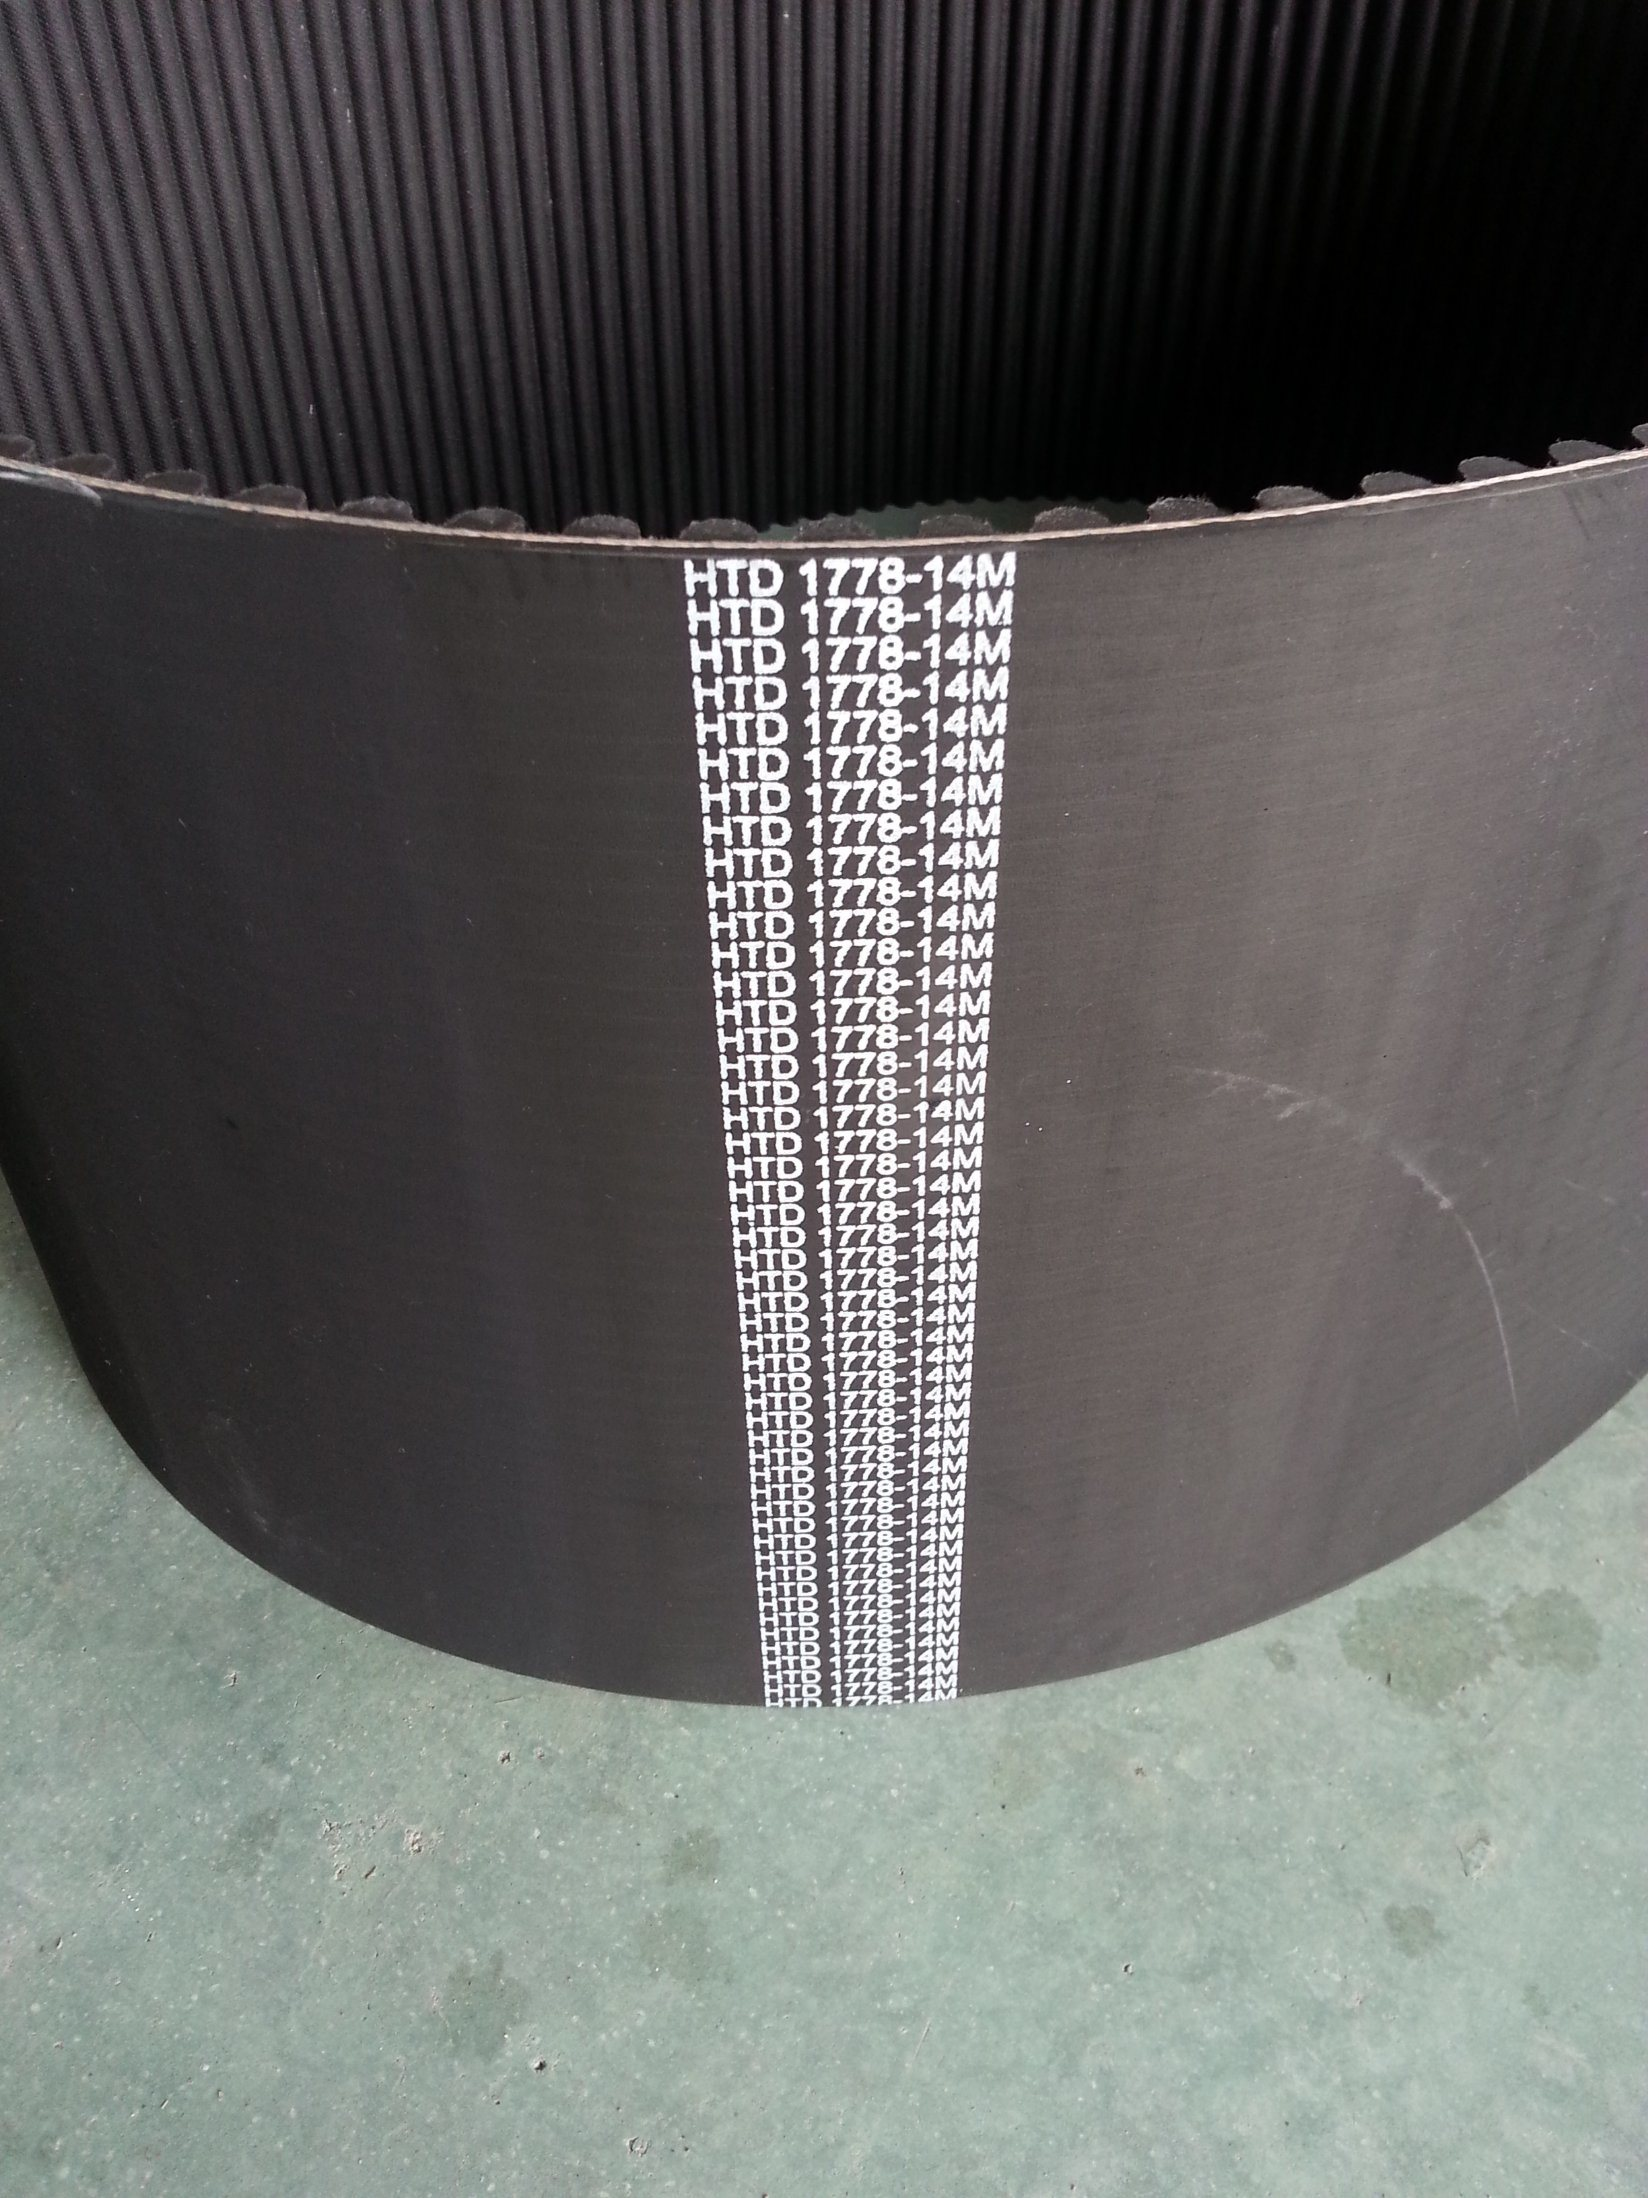 New Rubber Timing Belt Std2m, S3m, S5m, S8m, S14m